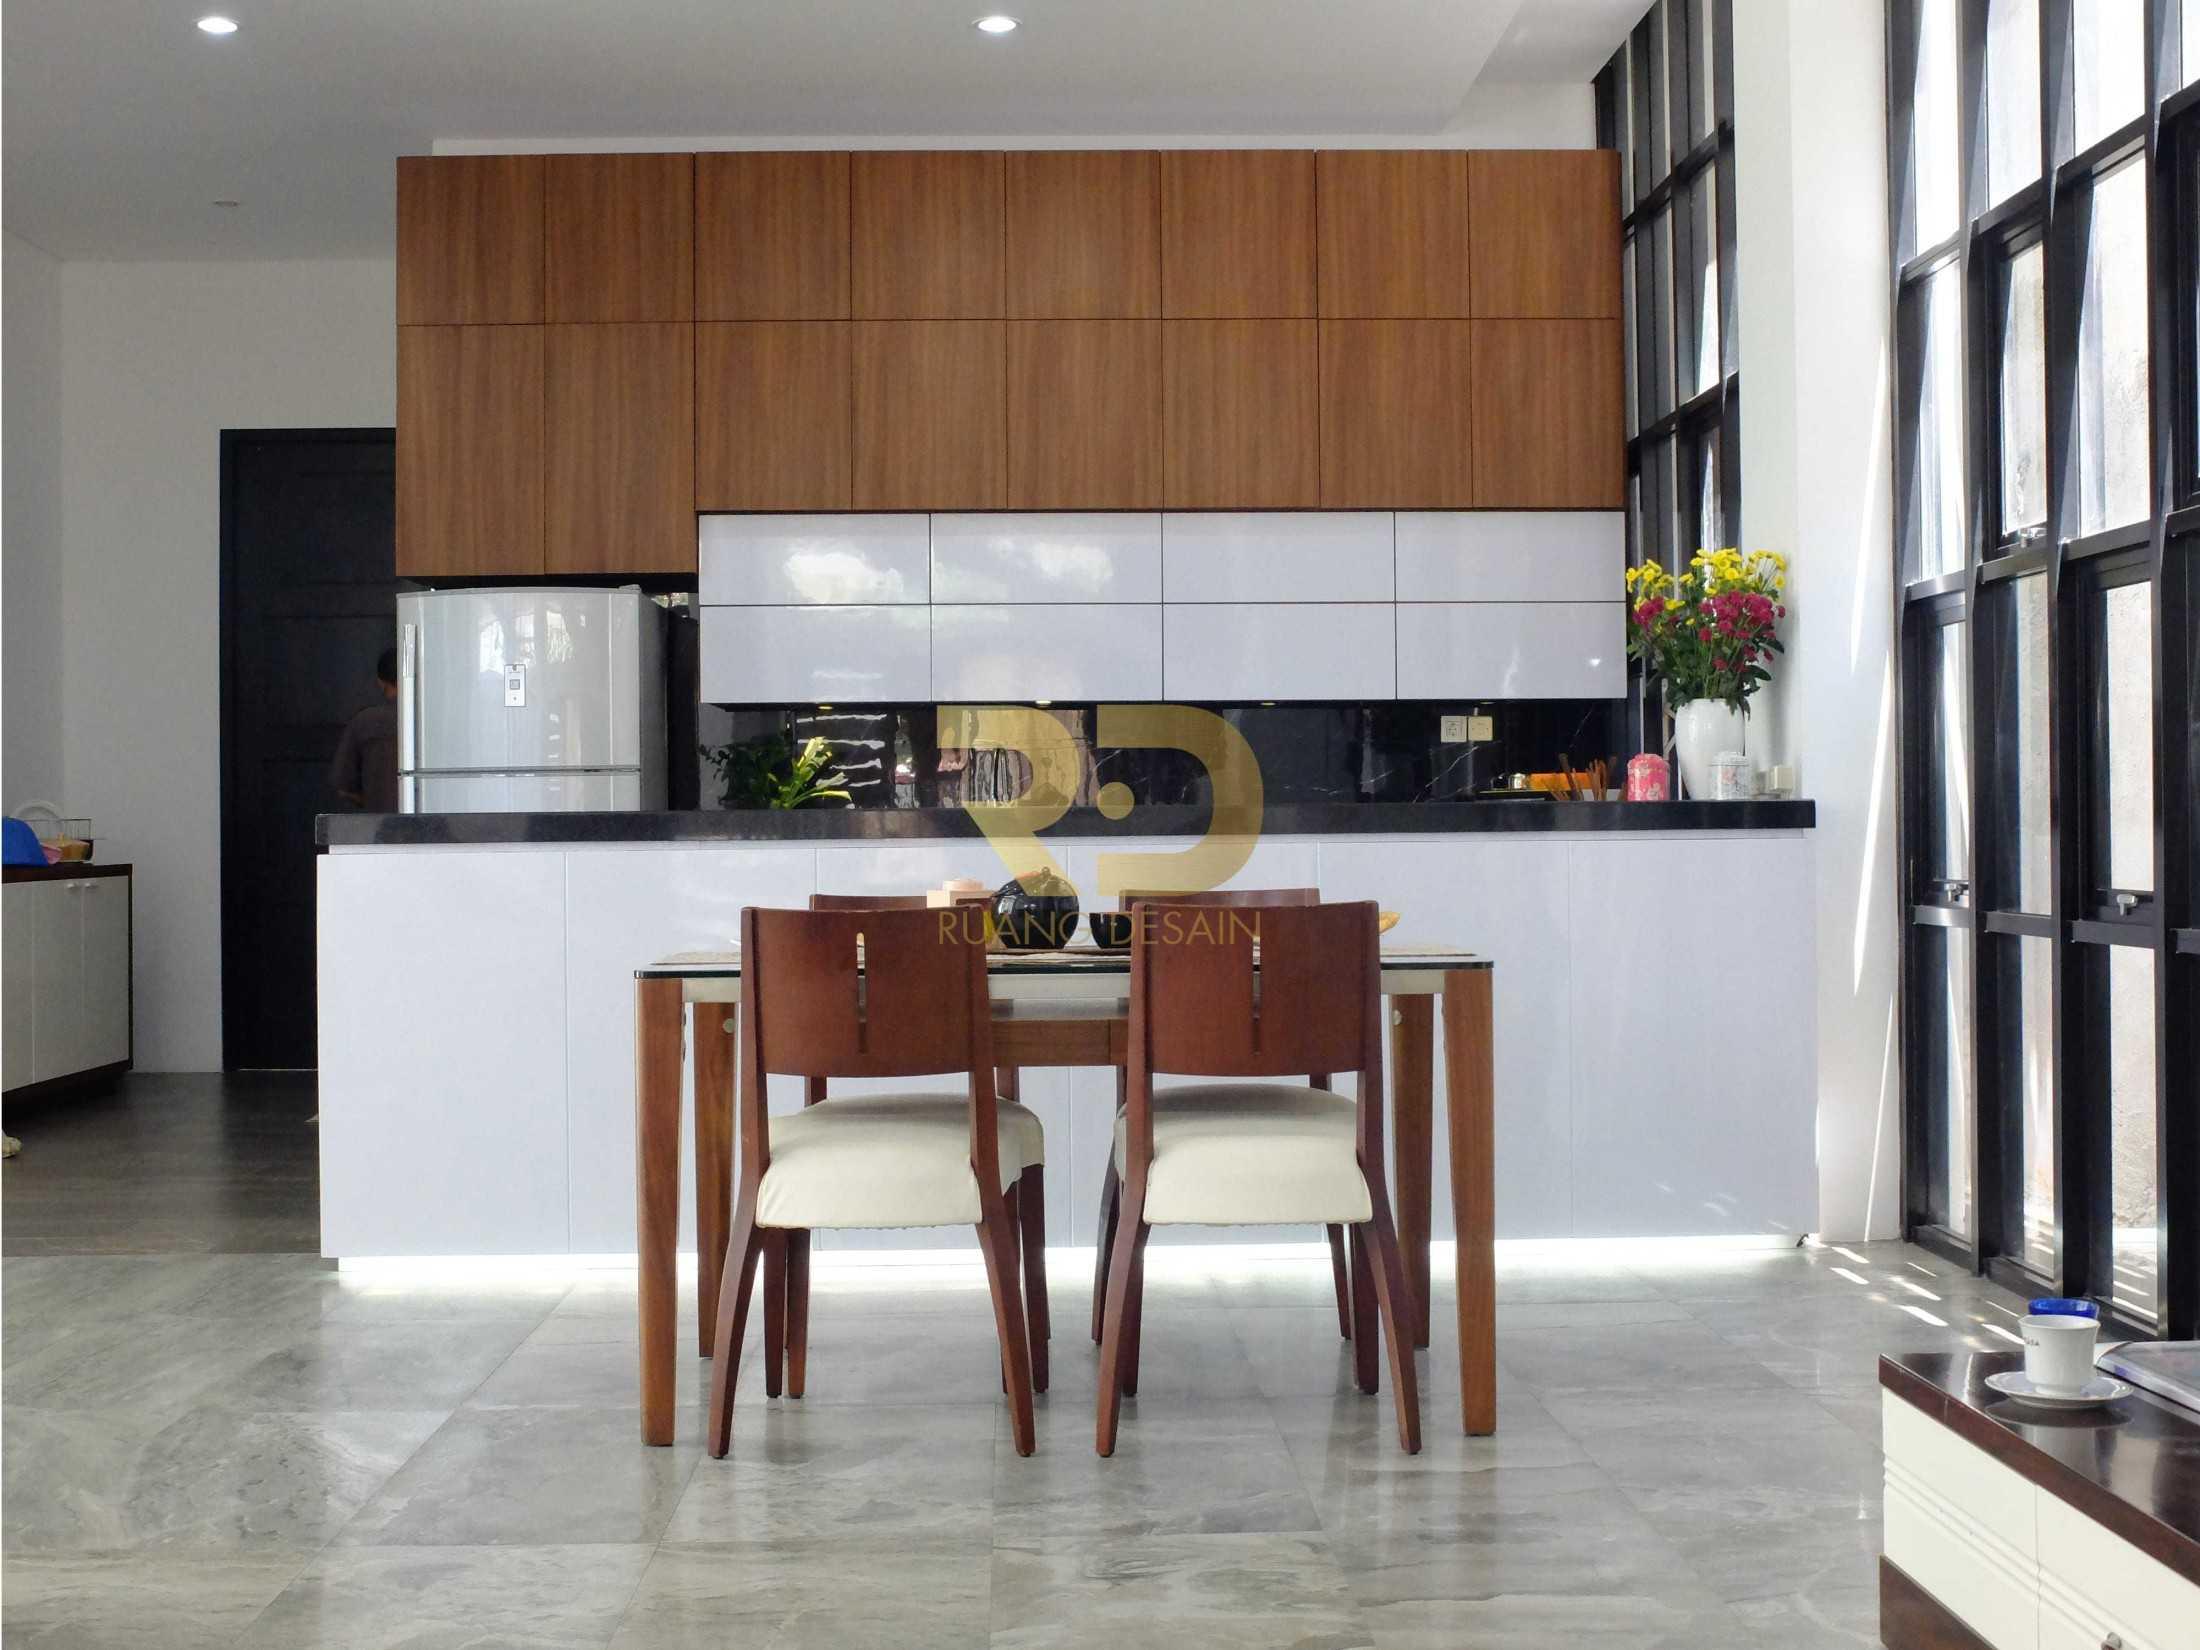 Ruang Desain White And Wood Surabaya, Kota Sby, Jawa Timur, Indonesia Surabaya, Kota Sby, Jawa Timur, Indonesia Ruang-Desain-White-And-Wood  92000